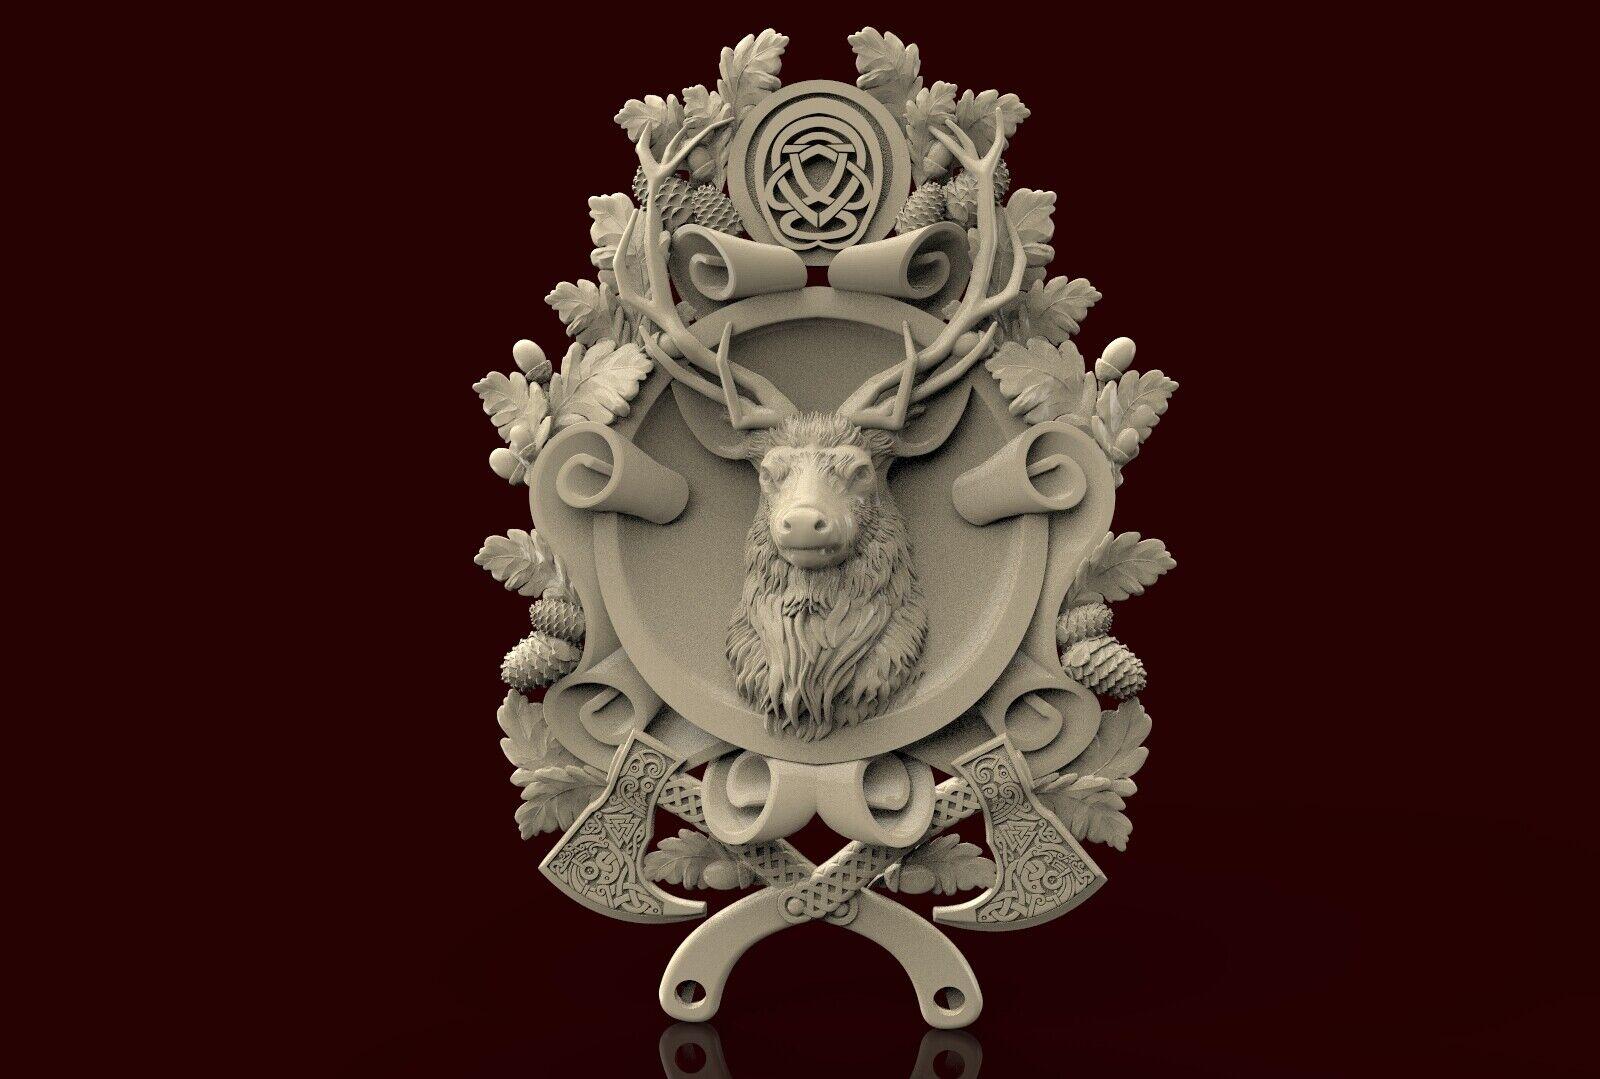 3D STL Models for CNC Router Engraver Carving Artcam Aspire Grapes 190